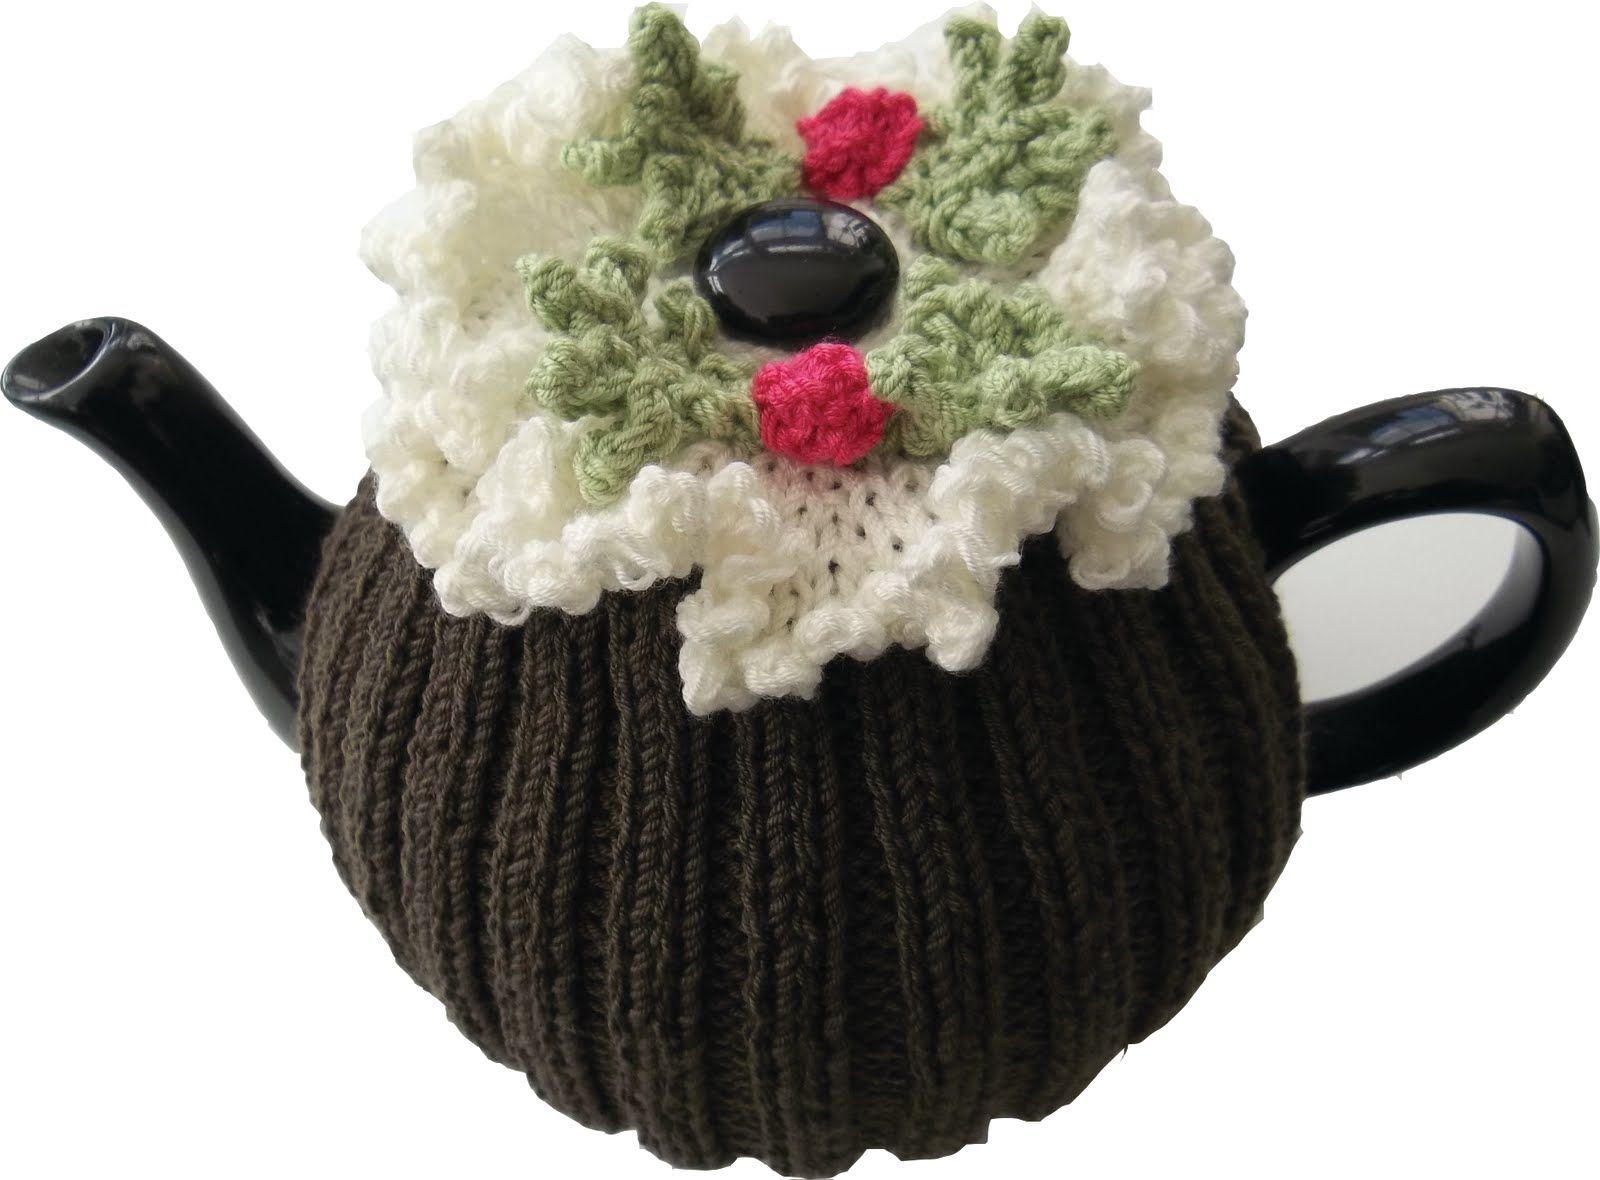 Easycrochetteacozypattern christmas pudding tea cosy easycrochetteacozypattern christmas pudding tea cosy bankloansurffo Choice Image